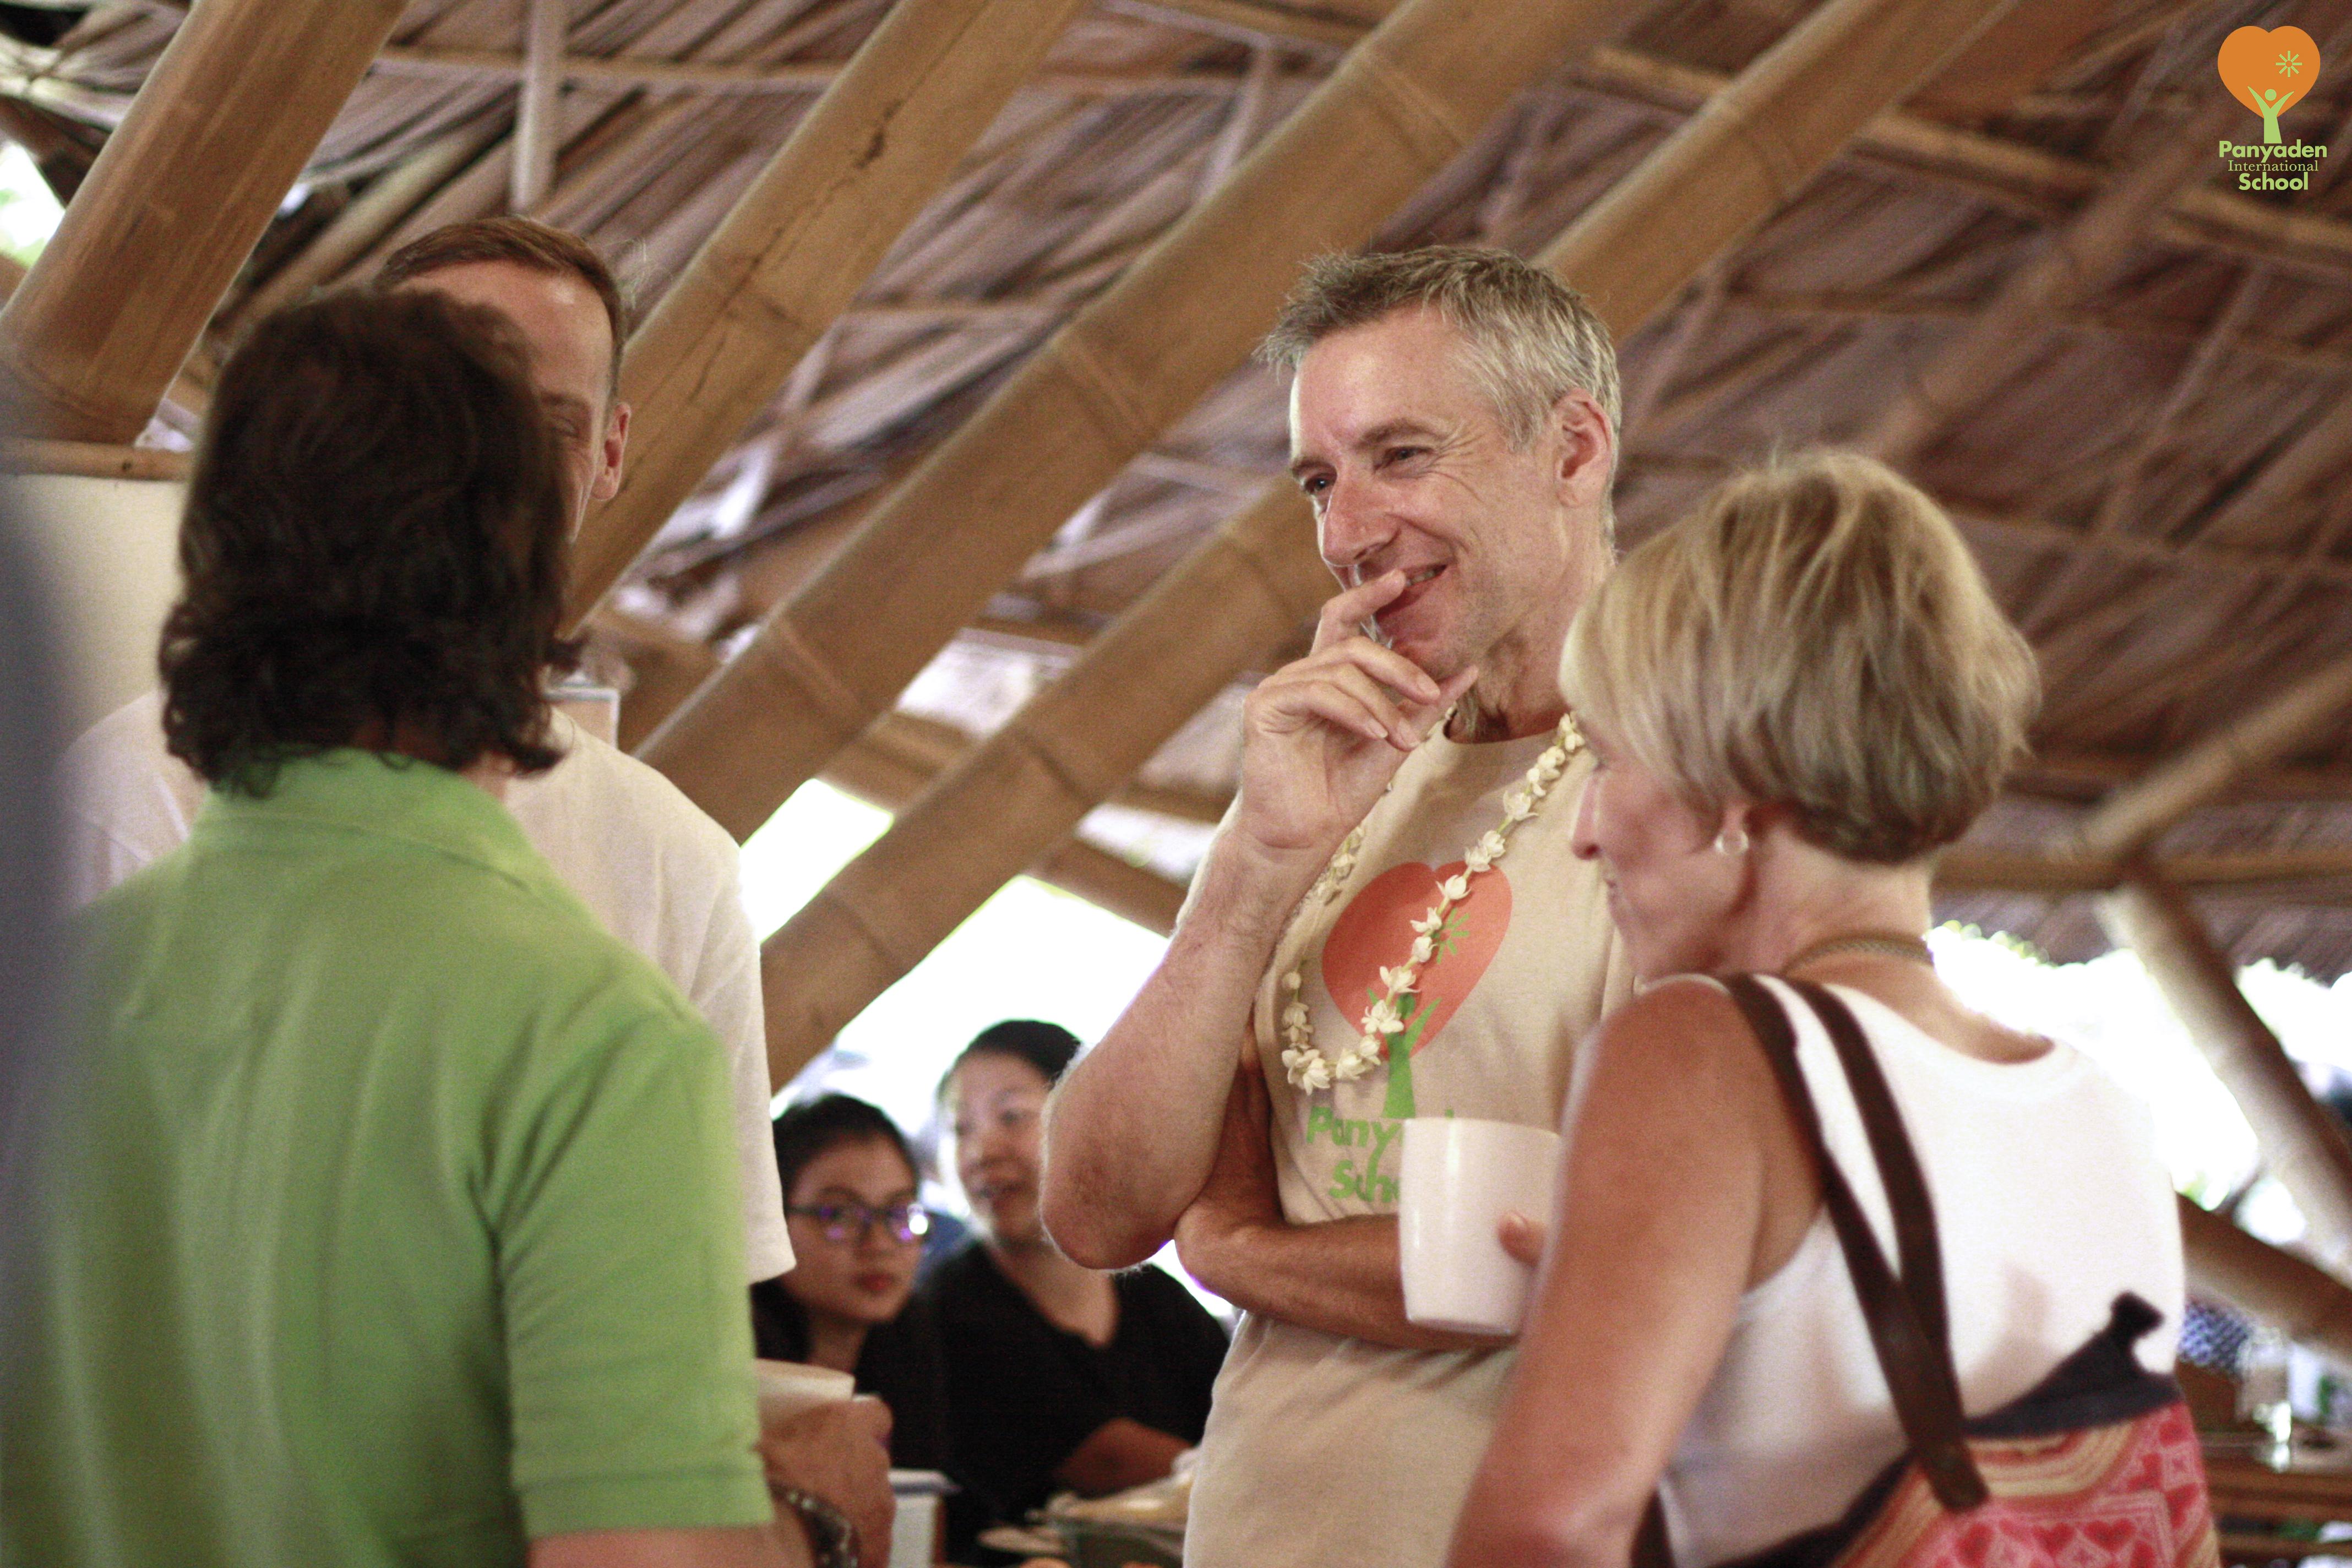 Panyaden International School Director chatting with parents, Blossom Market